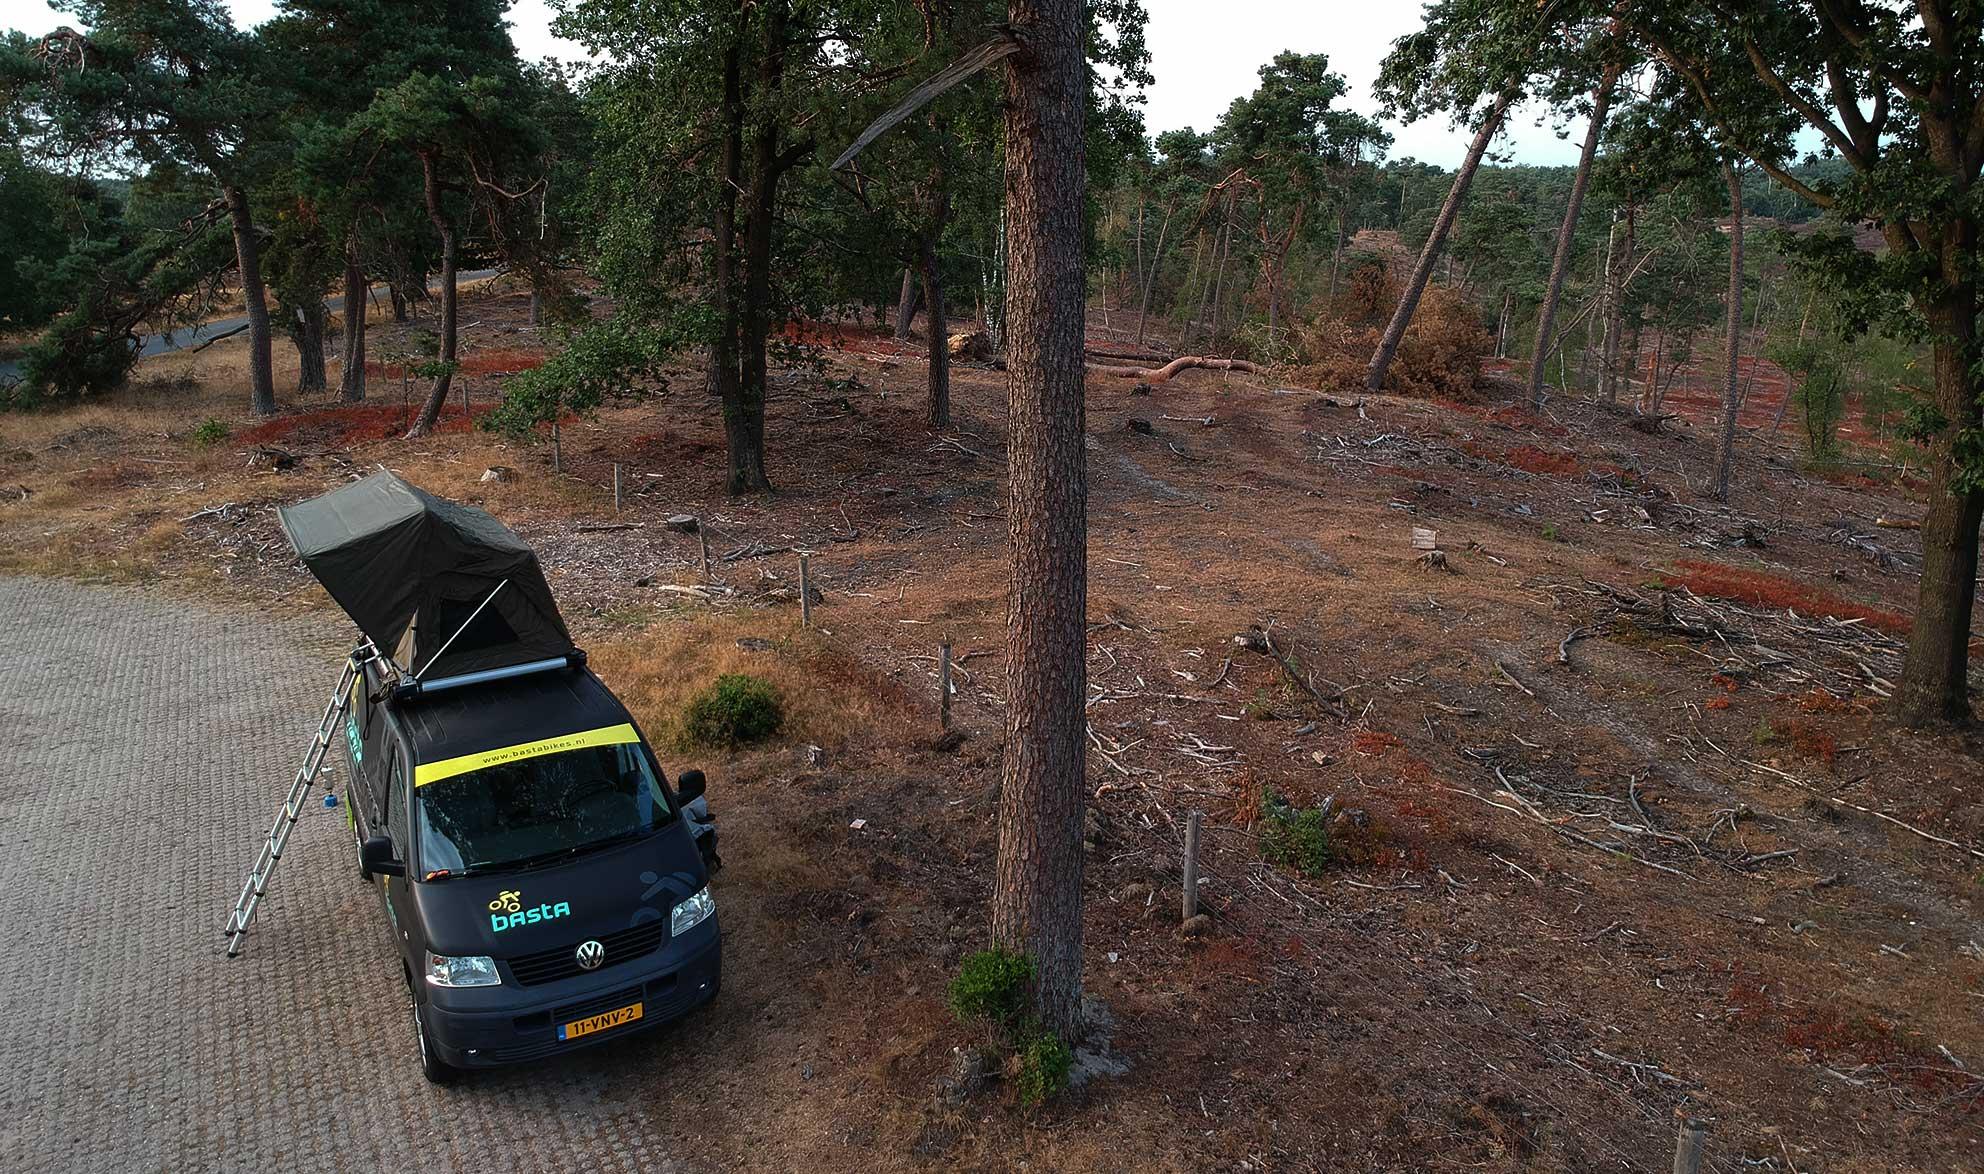 kampeer plek met een vw t5 daktent